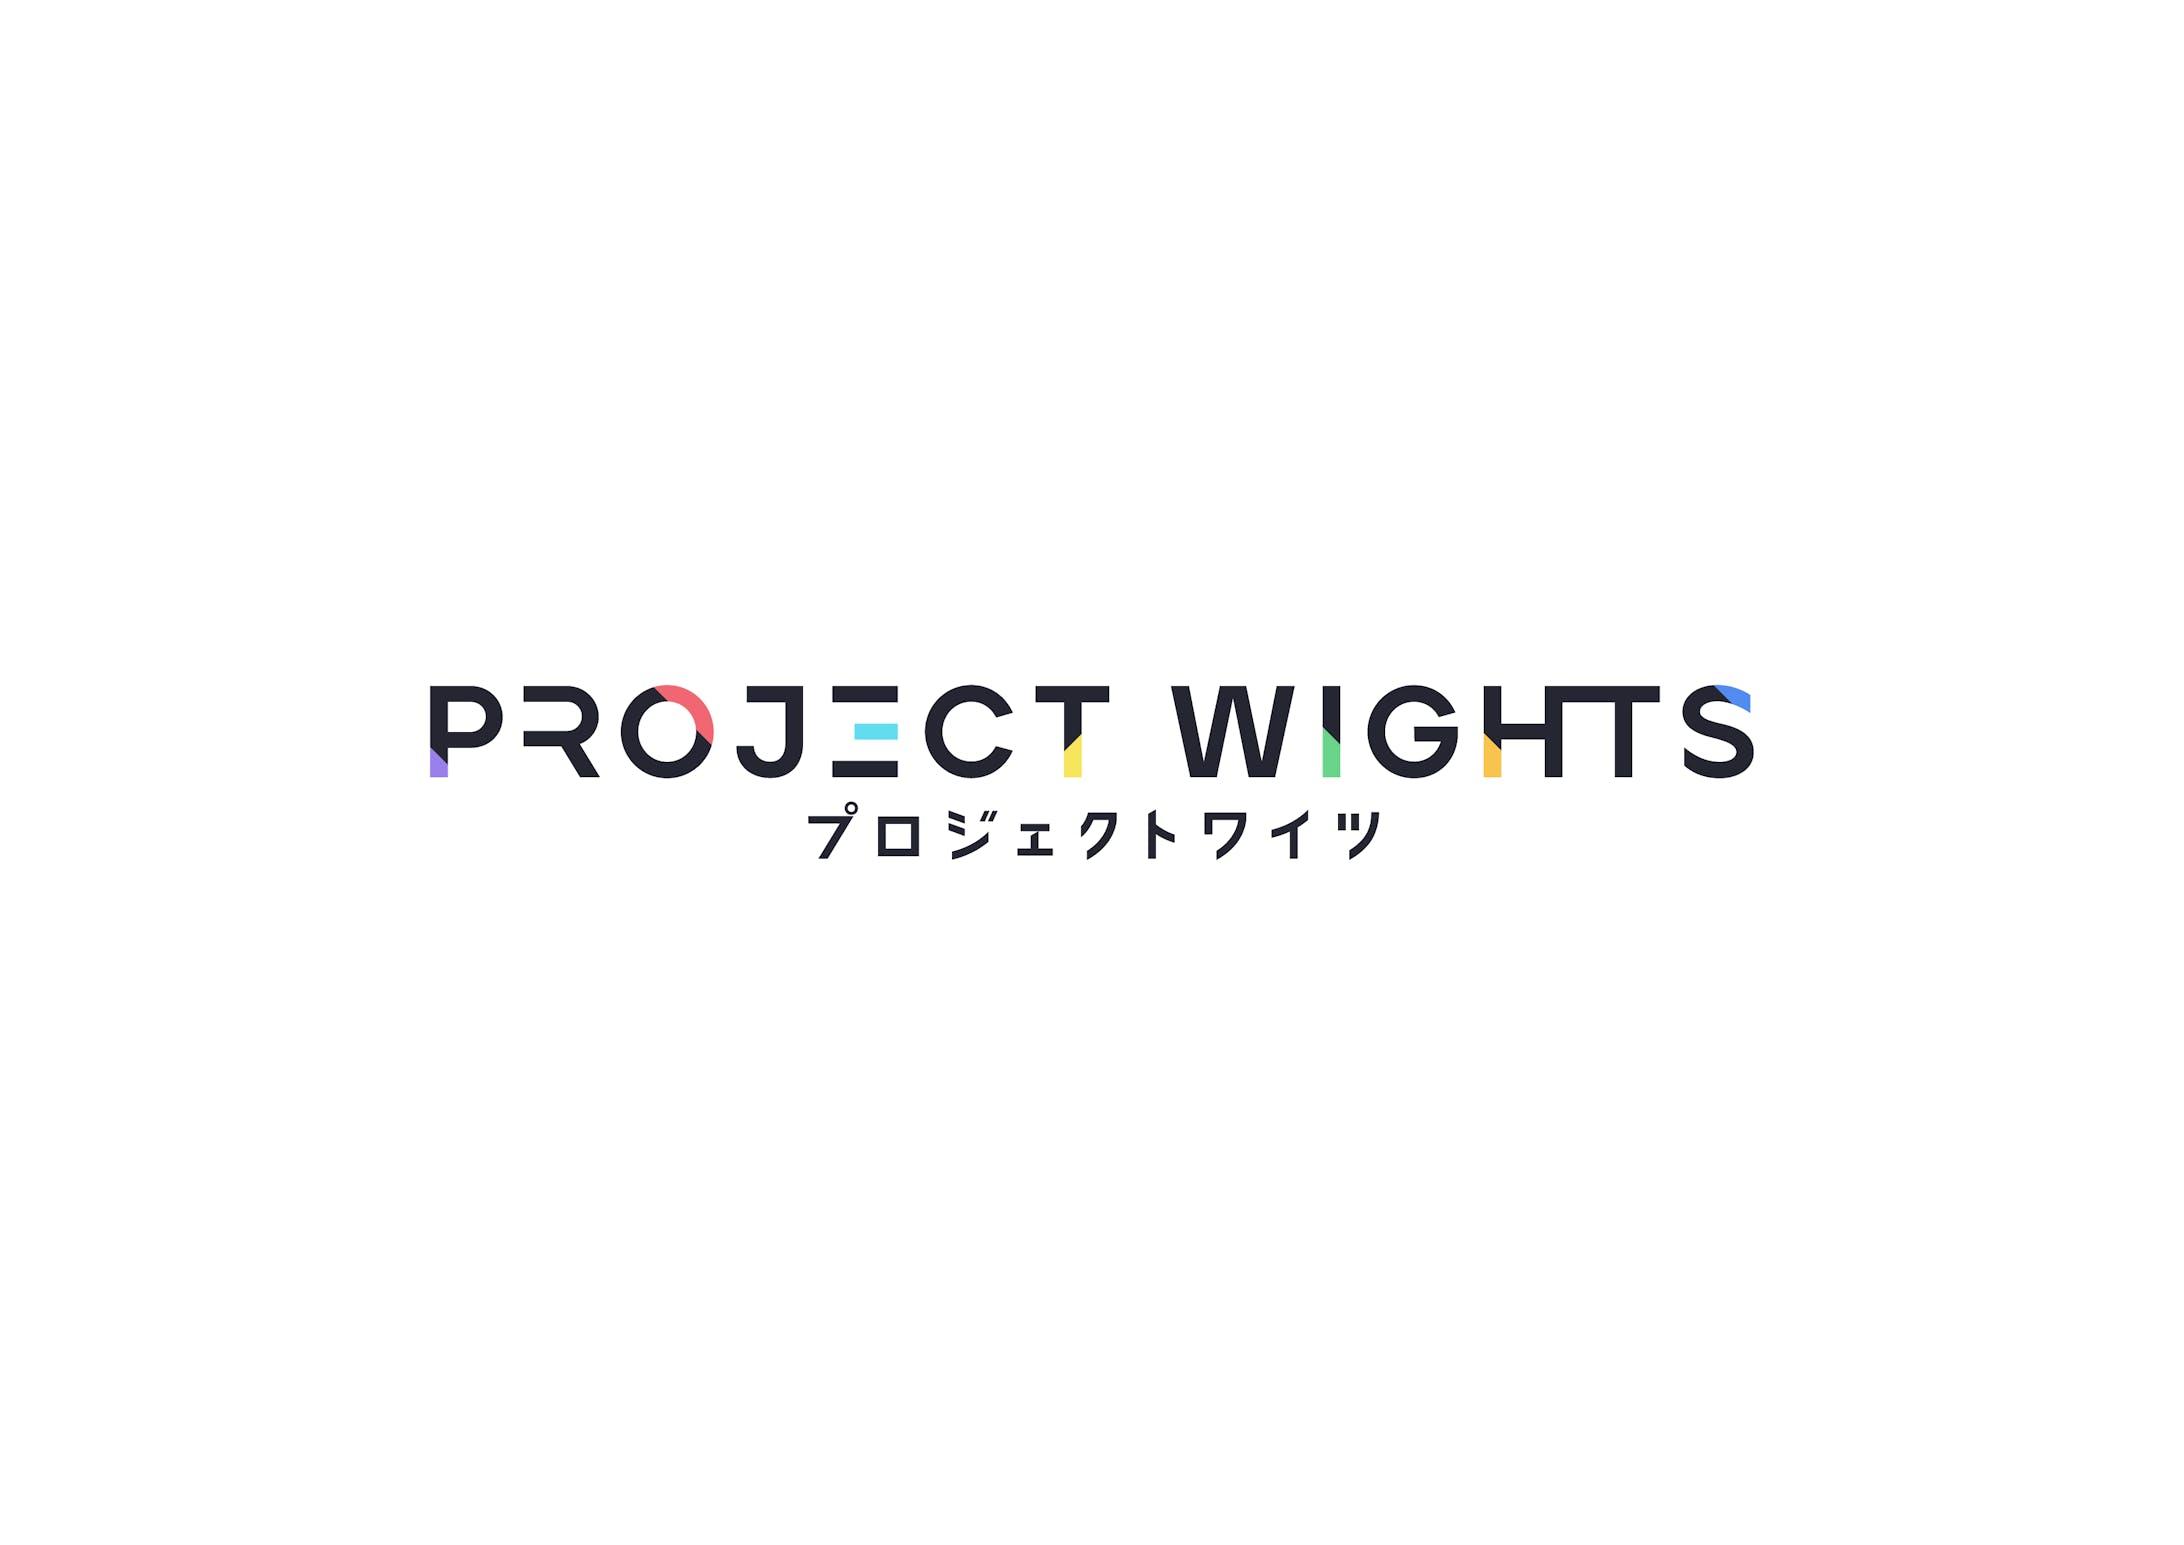 PROJECT WIGHTS - プロジェクトワイツ-1